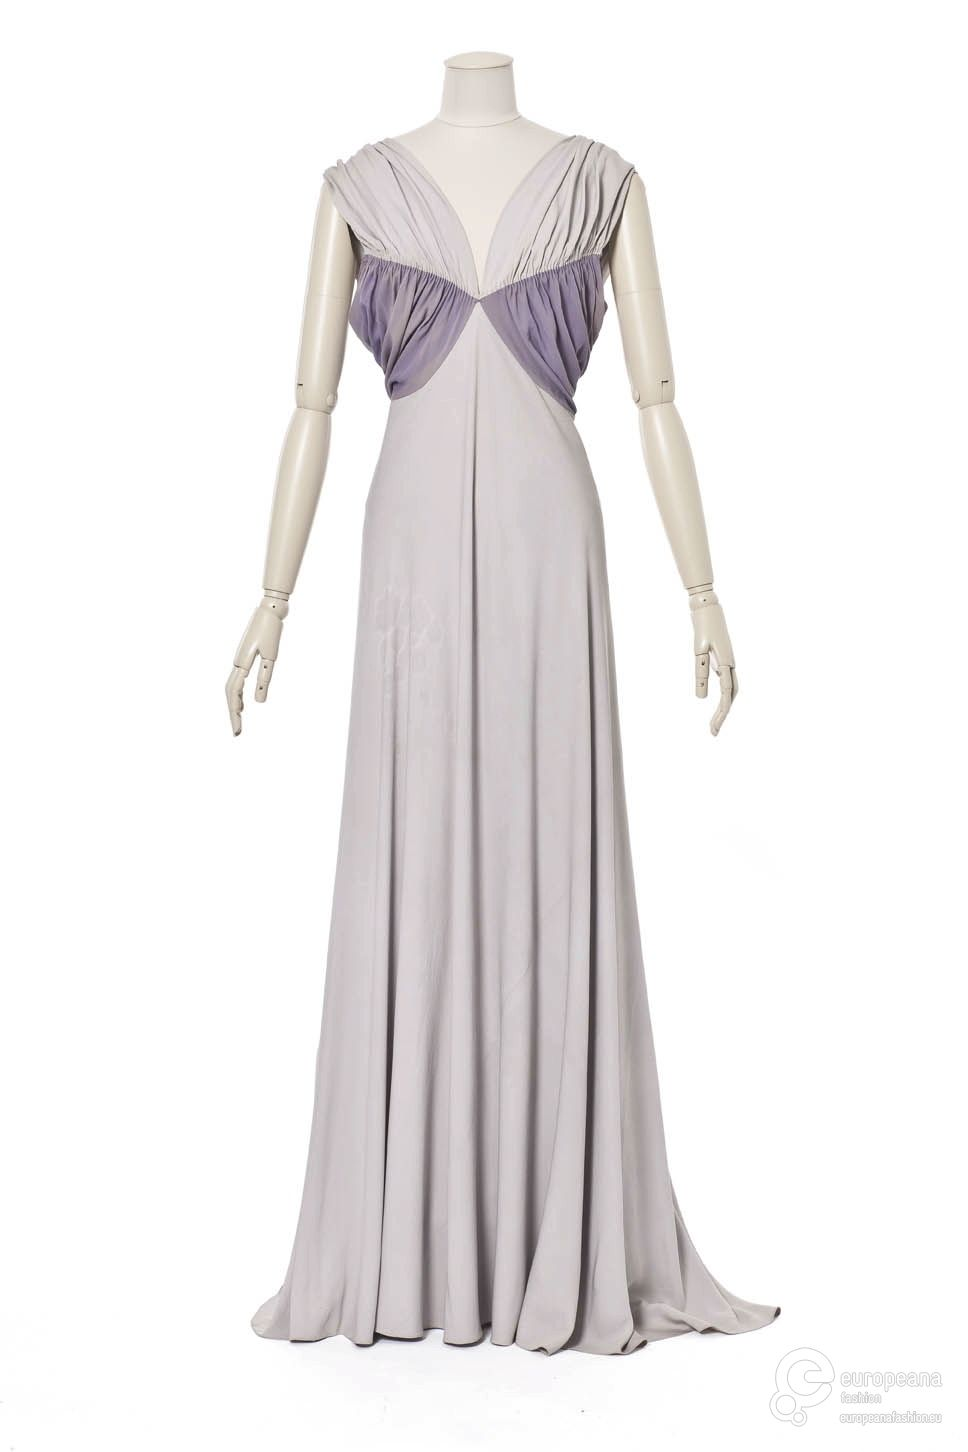 robe du soir Creation date 1938 Creator Madeleine Vionnet Object ...